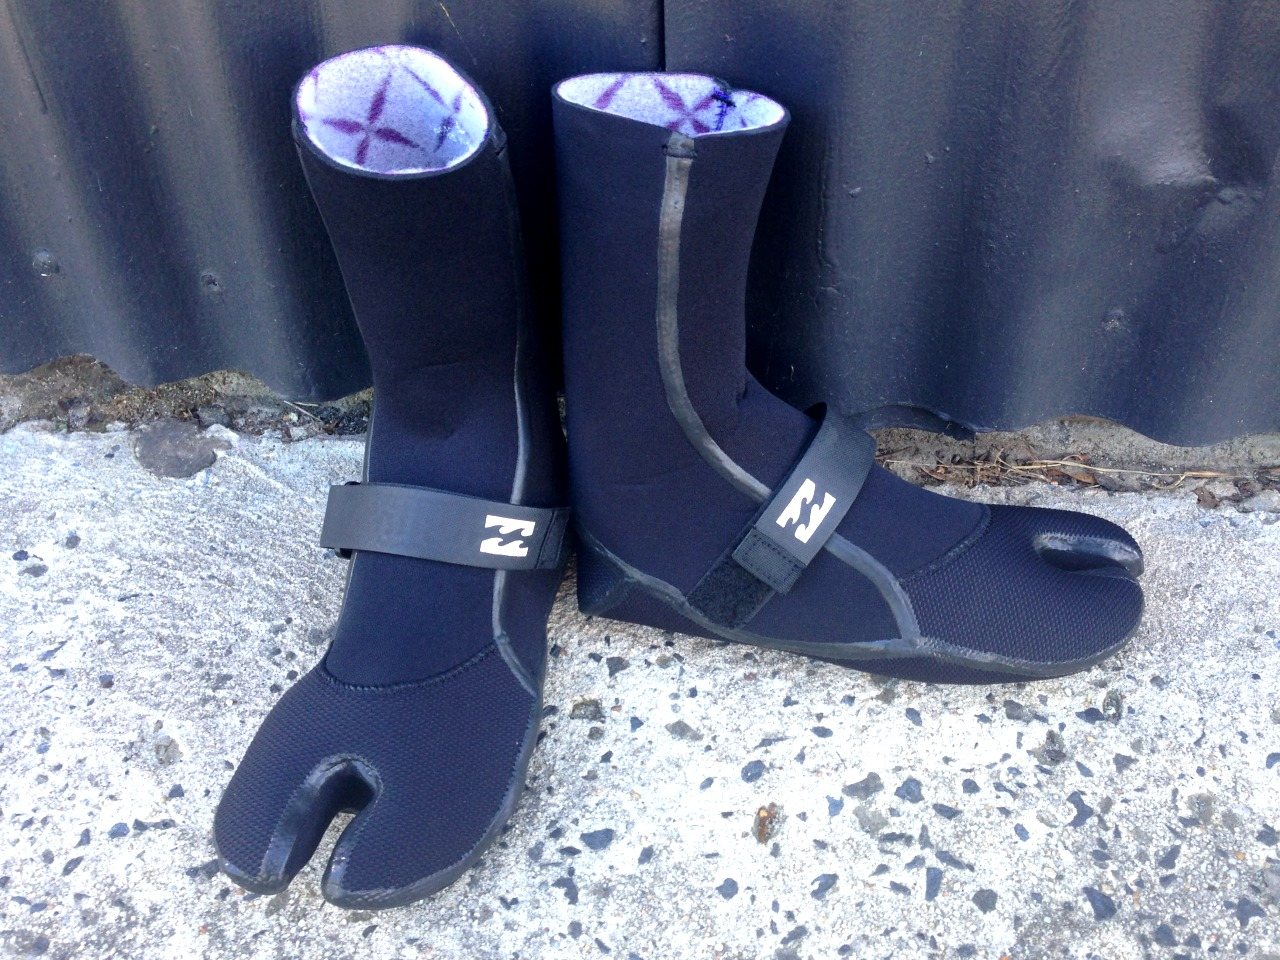 Billabong Furnace Pro Black Comp 2mm Boot